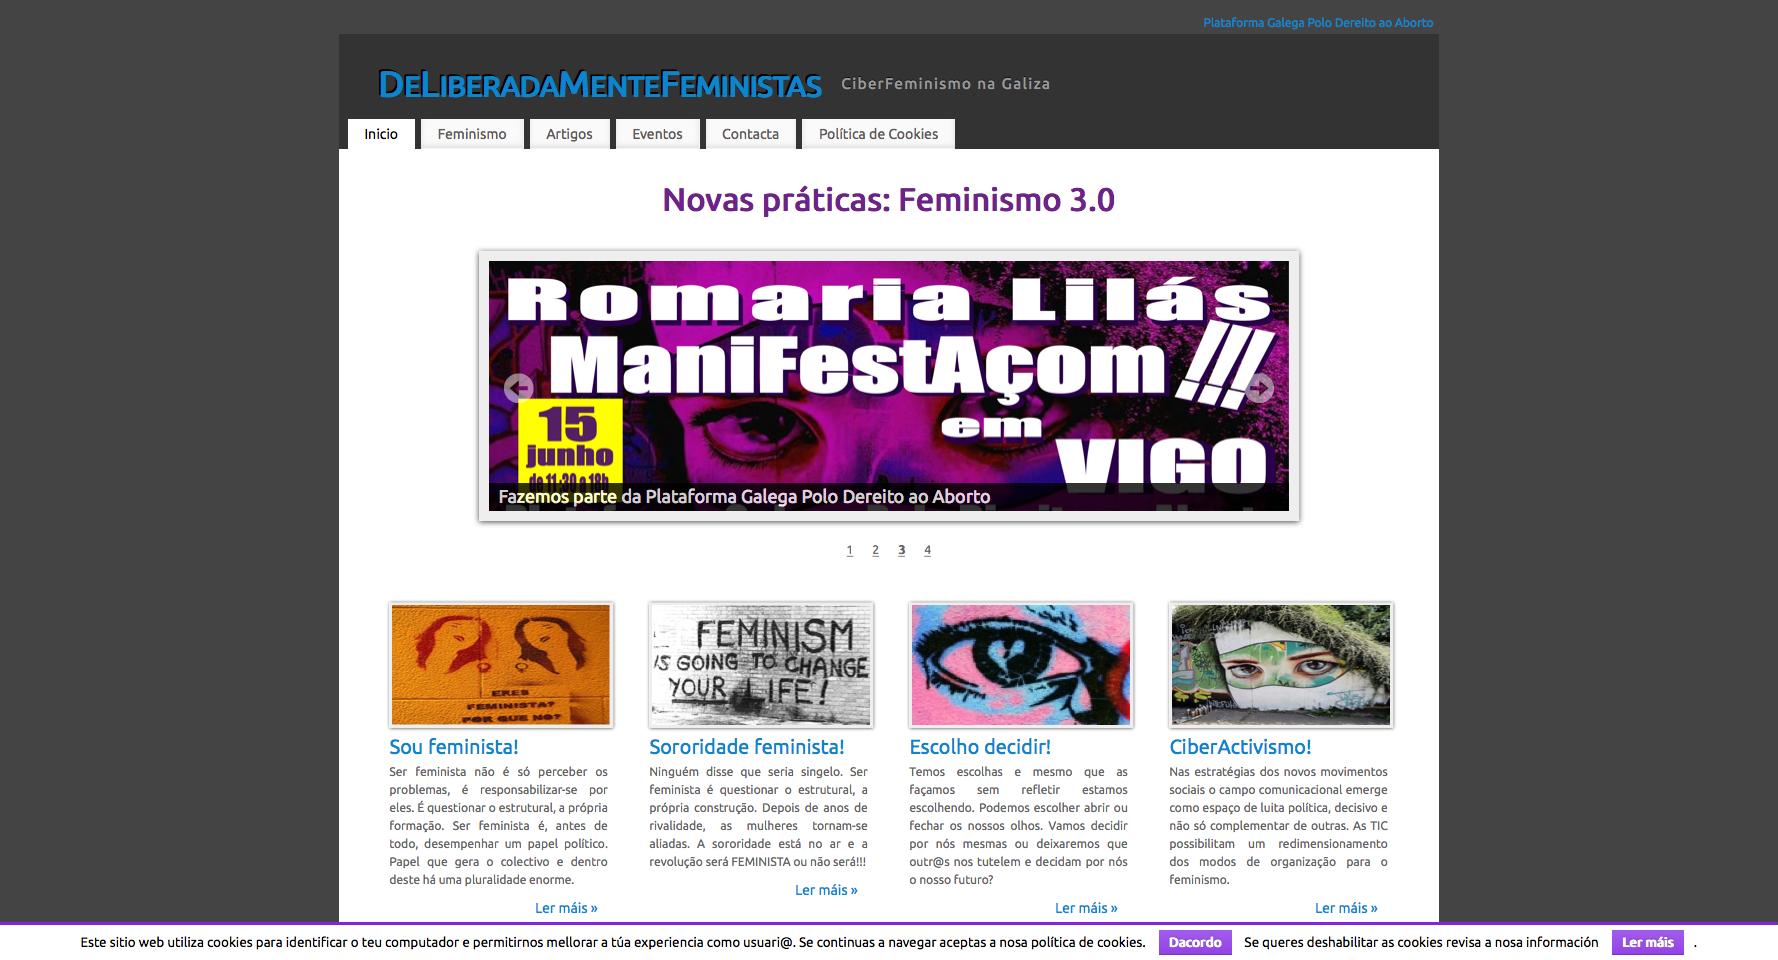 feminismo.eu